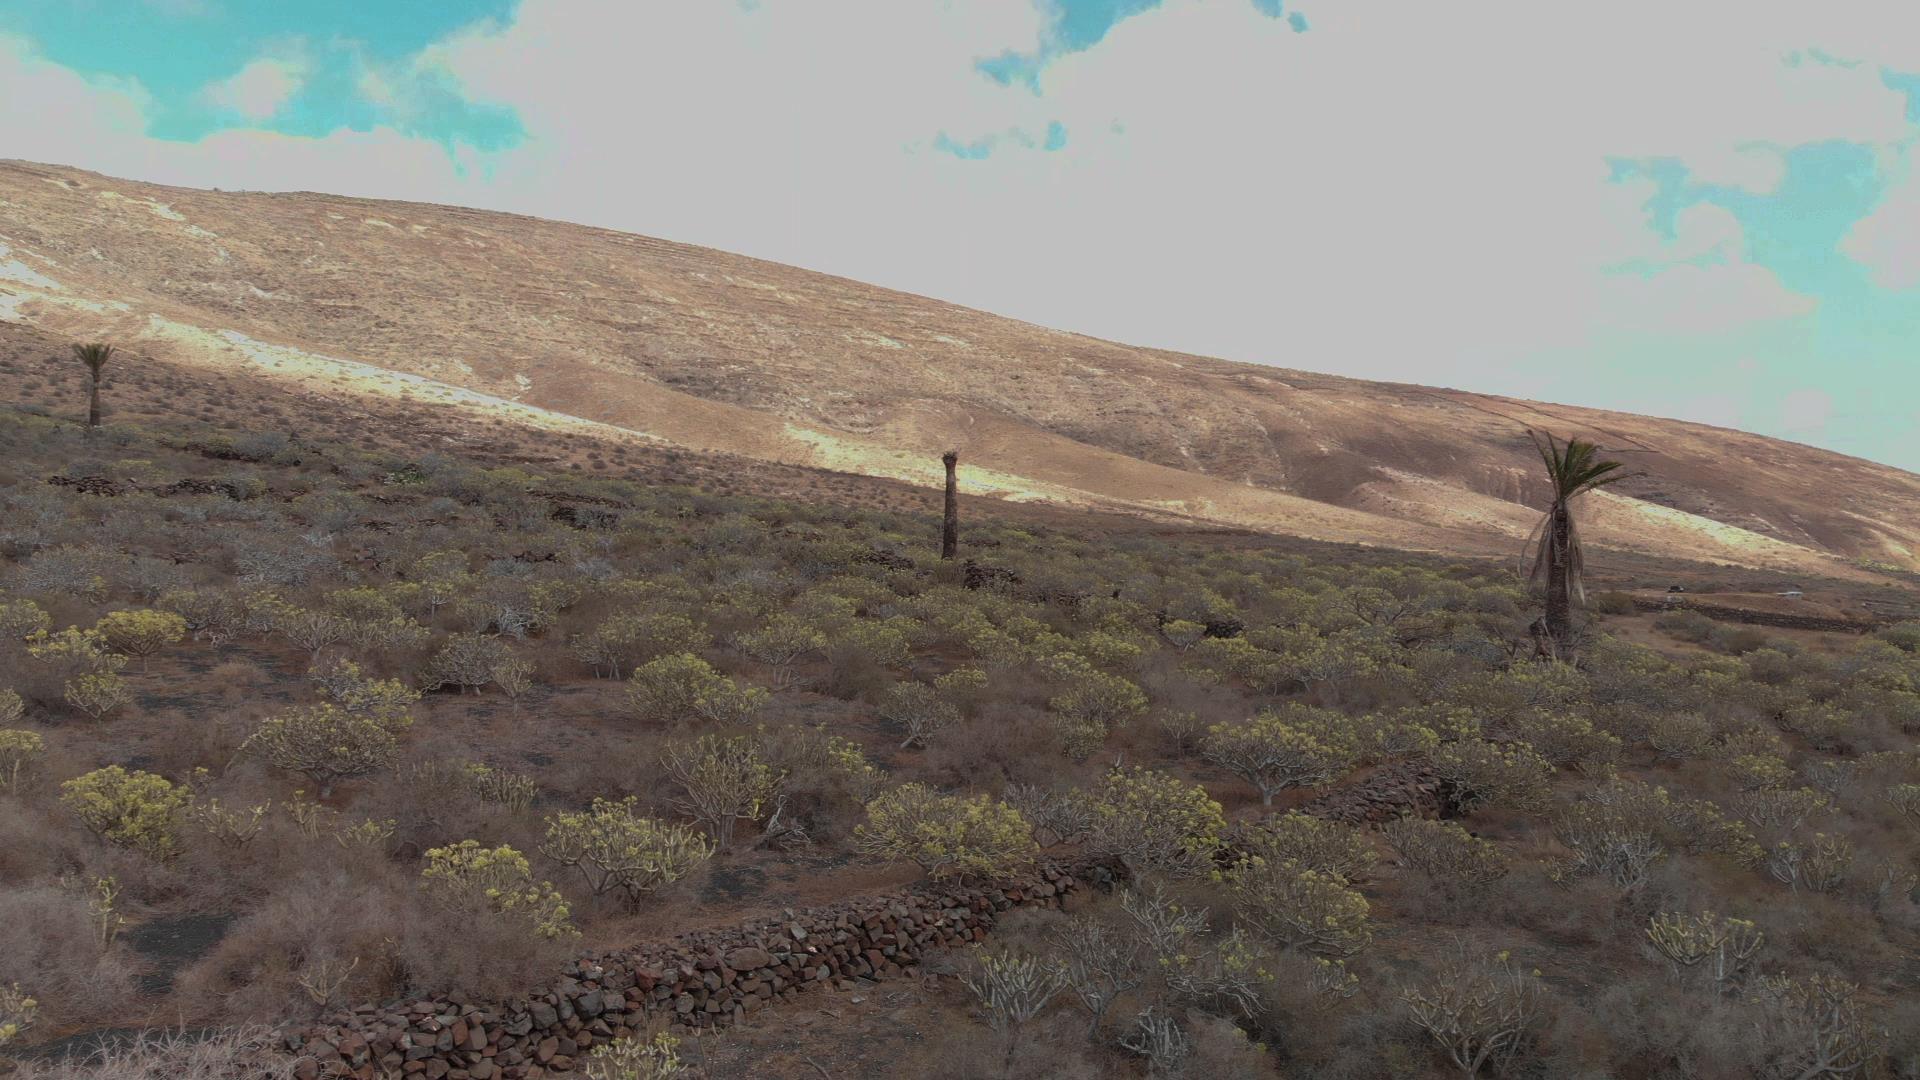 YouTube 190918 Tabayesco 2 Valle de Temisa 0230 0231